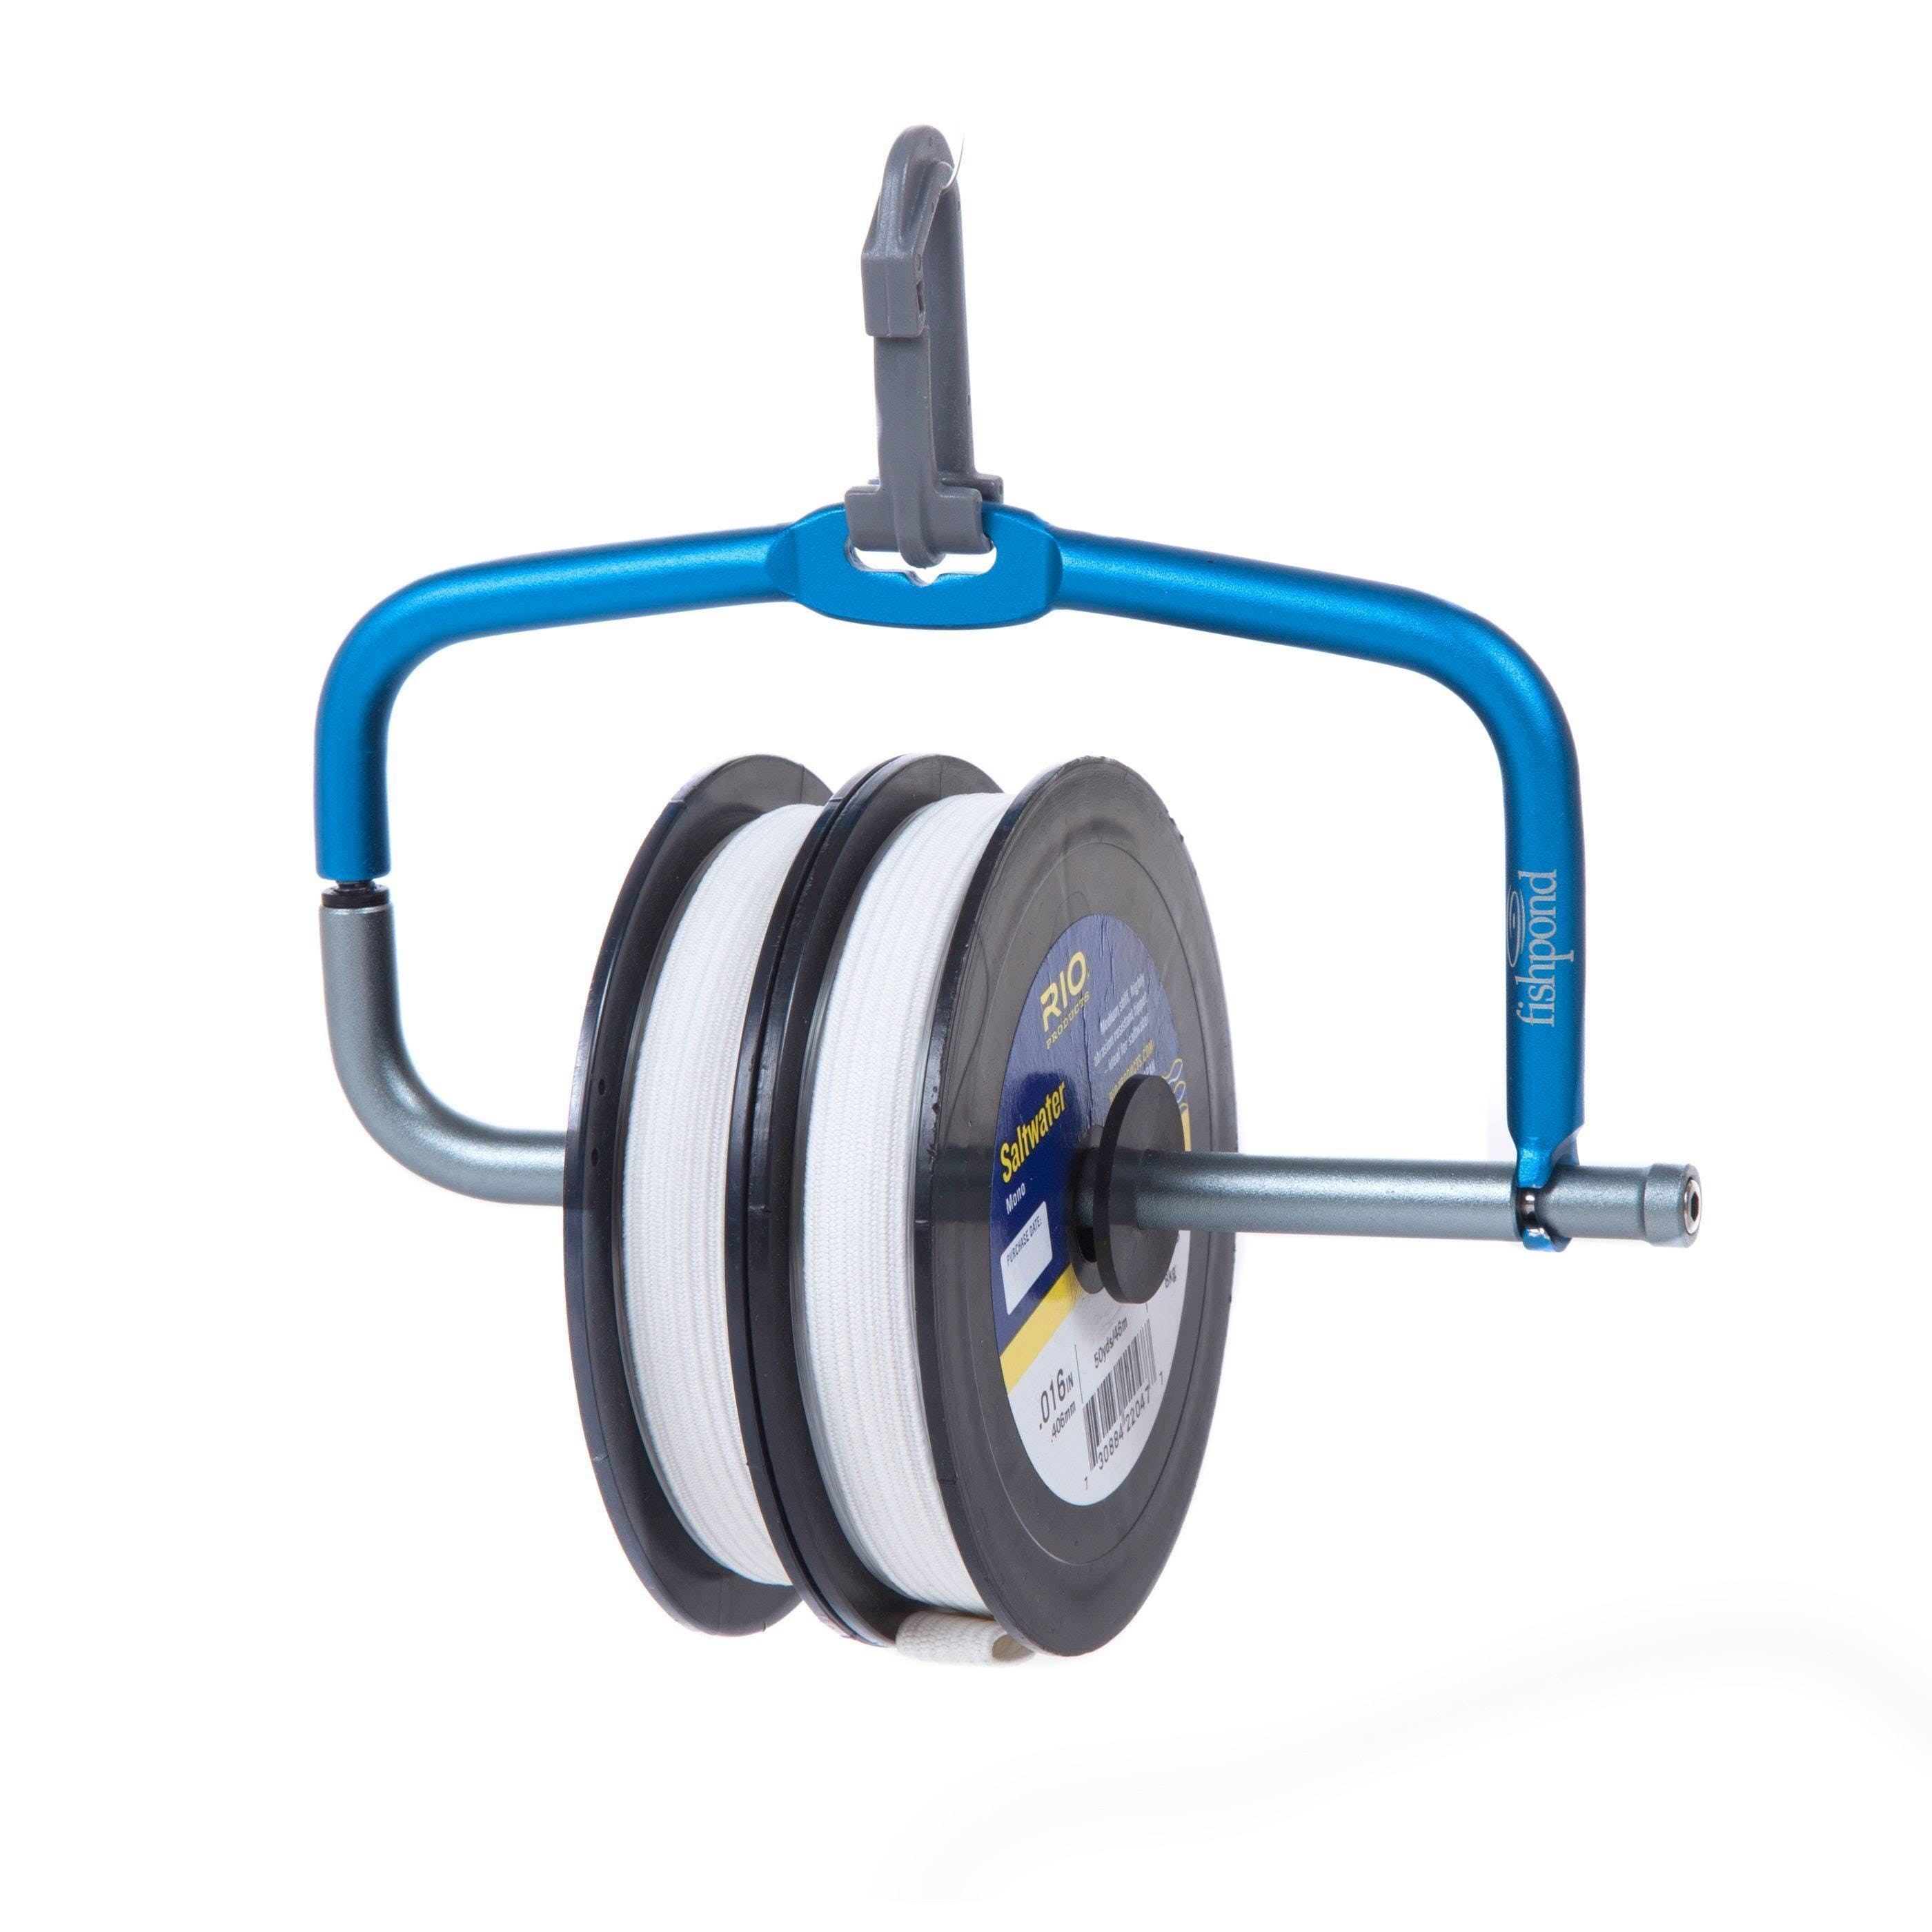 Fishpond - Headgate XL Tippet Holder